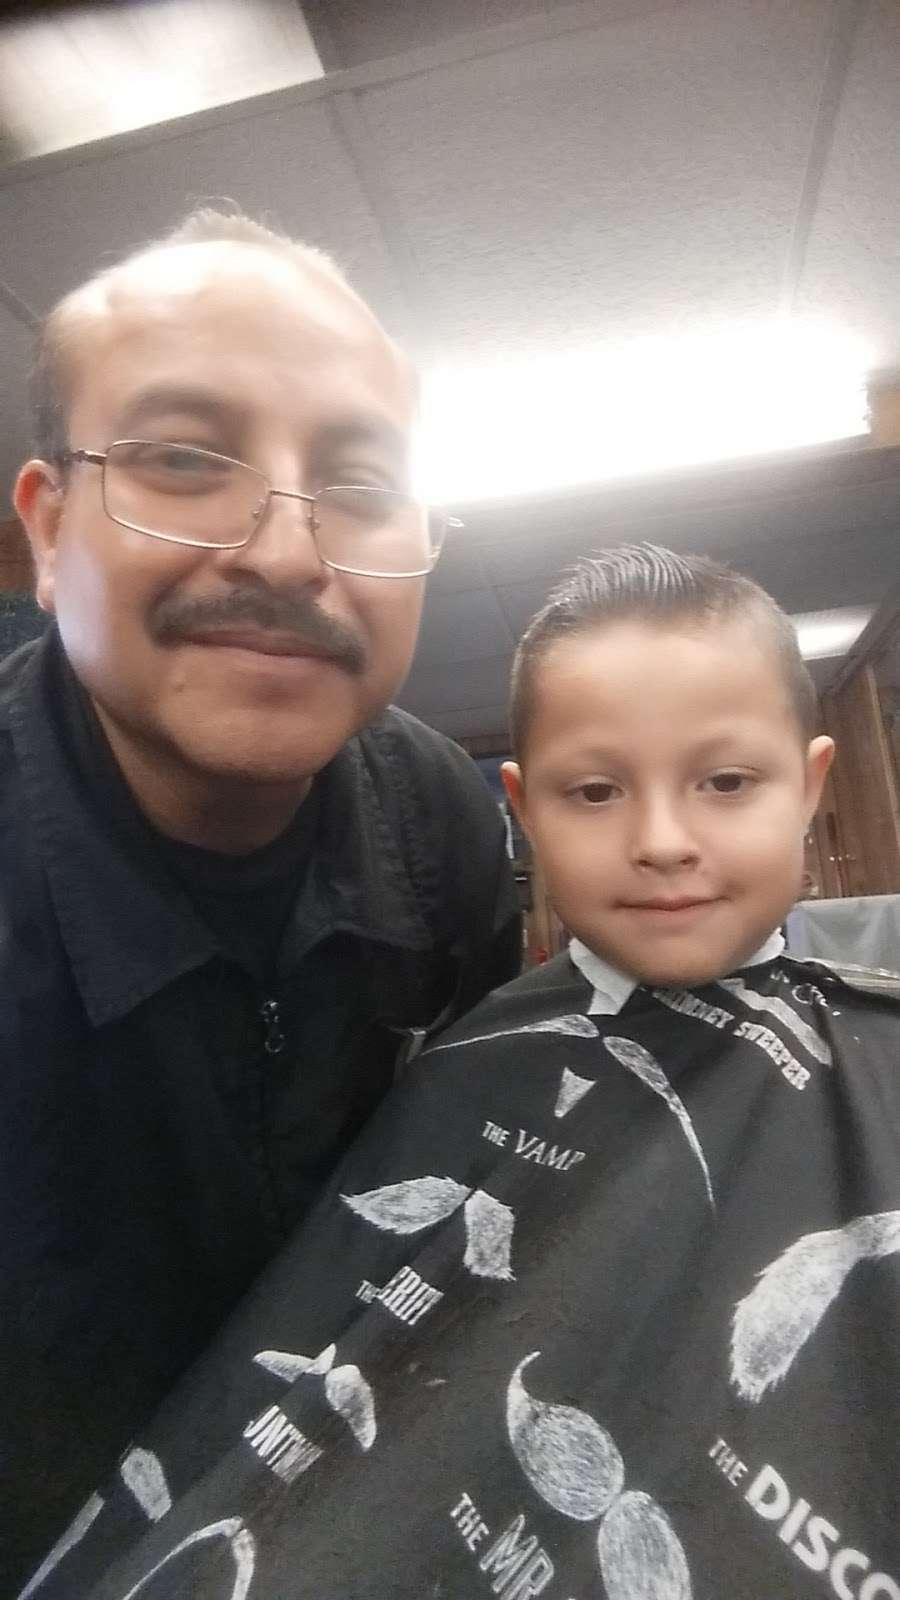 Joses Barber Shop - hair care  | Photo 5 of 10 | Address: 1317, 2006A Southmore Ave, Pasadena, TX 77502, USA | Phone: (832) 322-0981